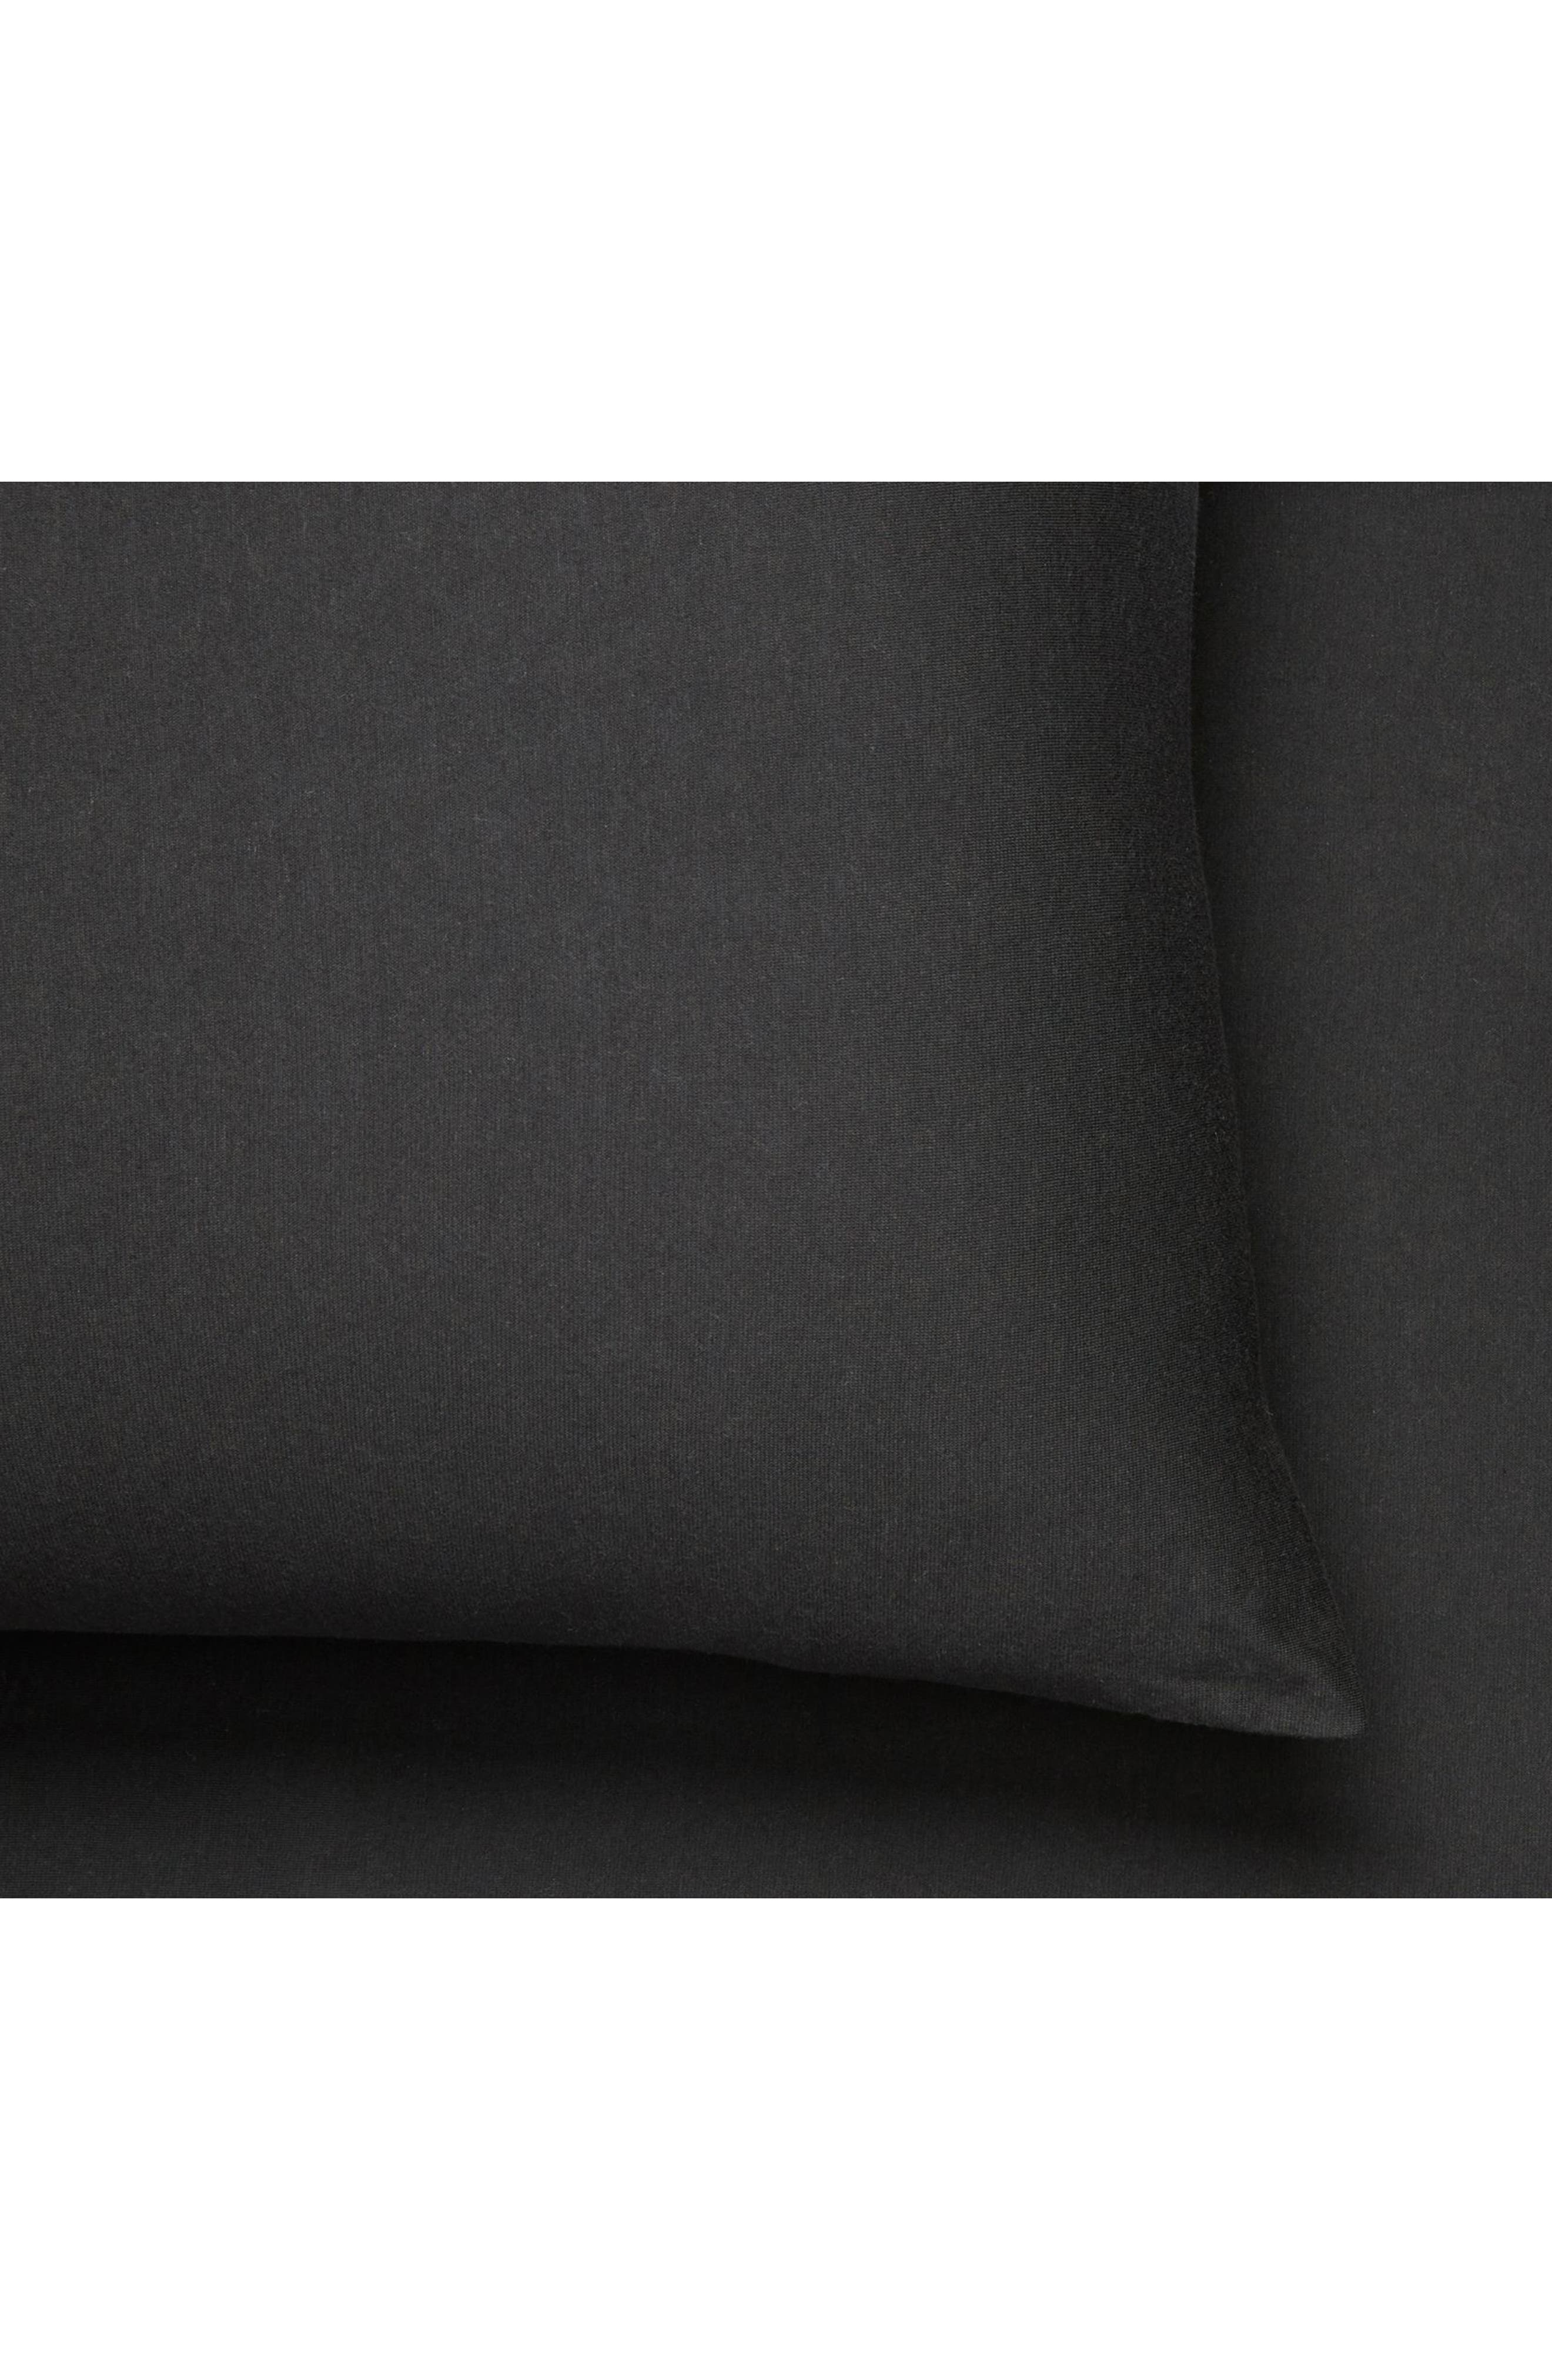 Home Harrison Set of 2 Pillowcases,                             Alternate thumbnail 2, color,                             BLACK